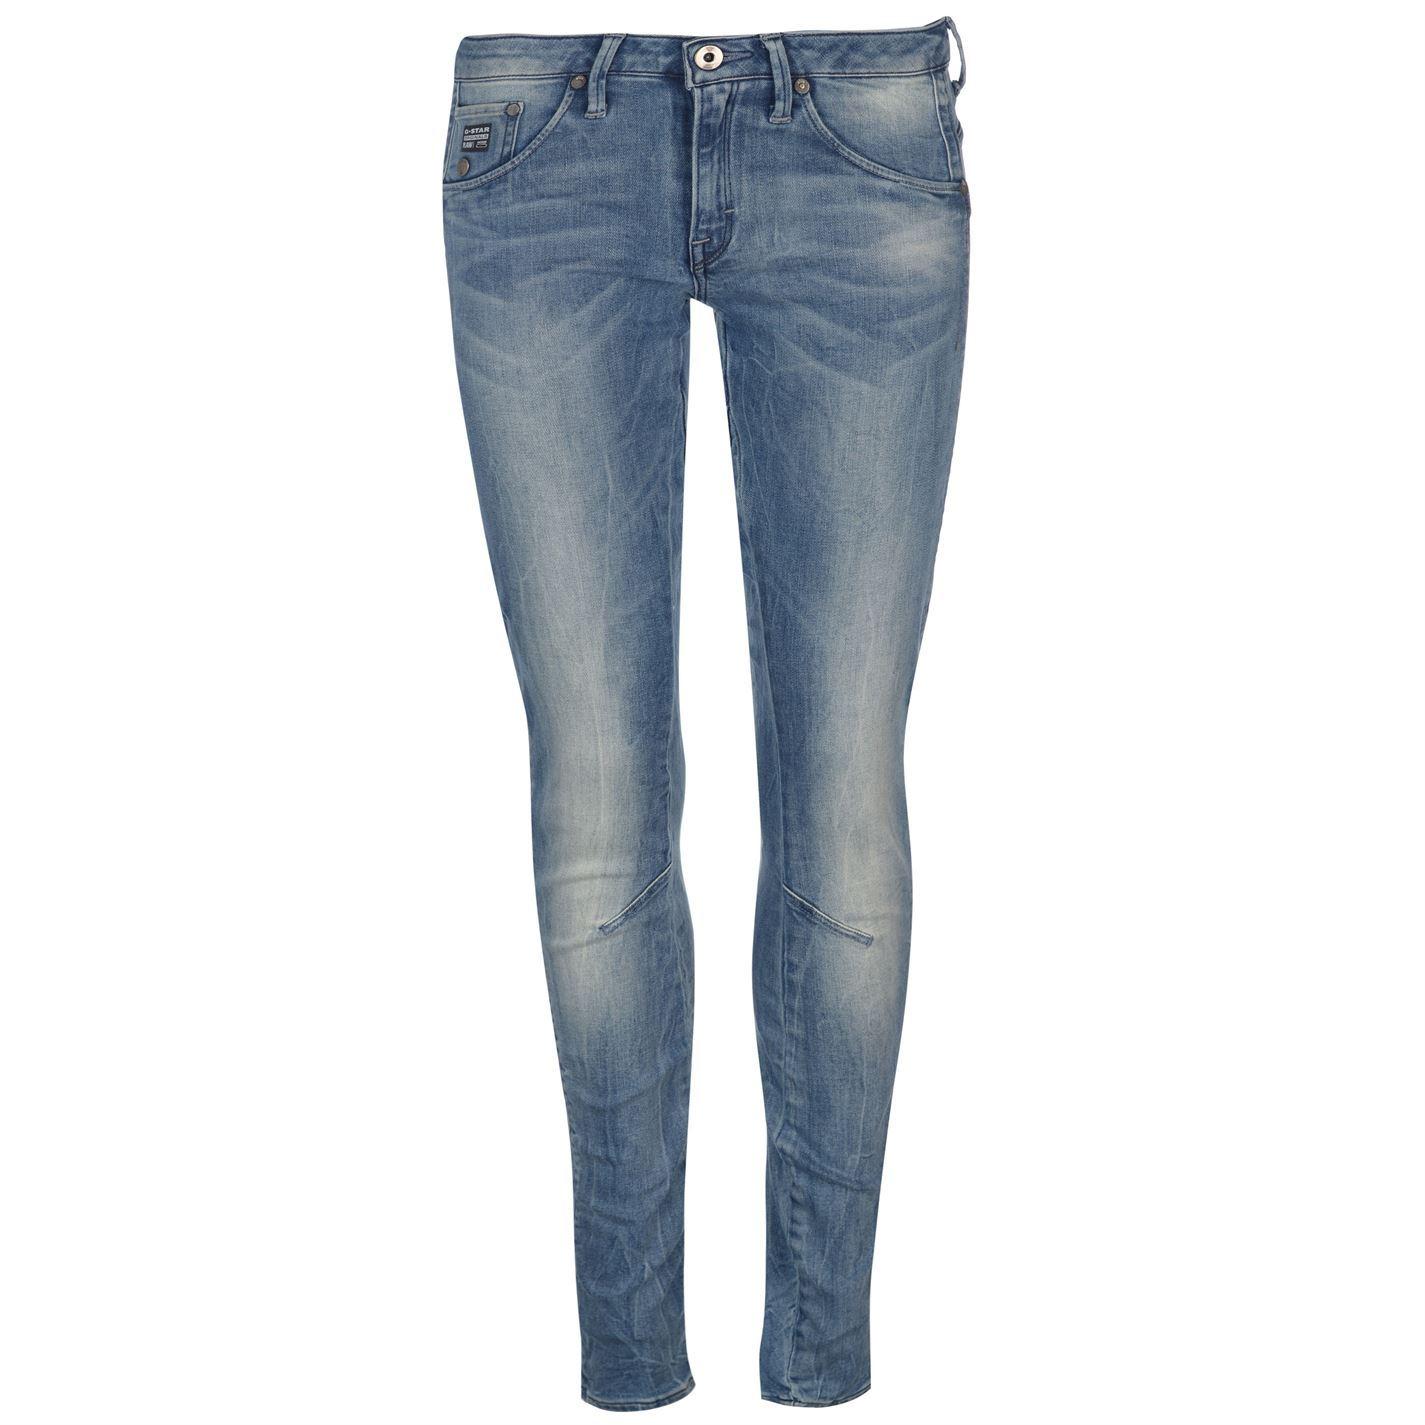 G-Star-Womens-Arc-3D-Super-Skinny-Jeans-Pants-Trousers-Bottoms-Zip